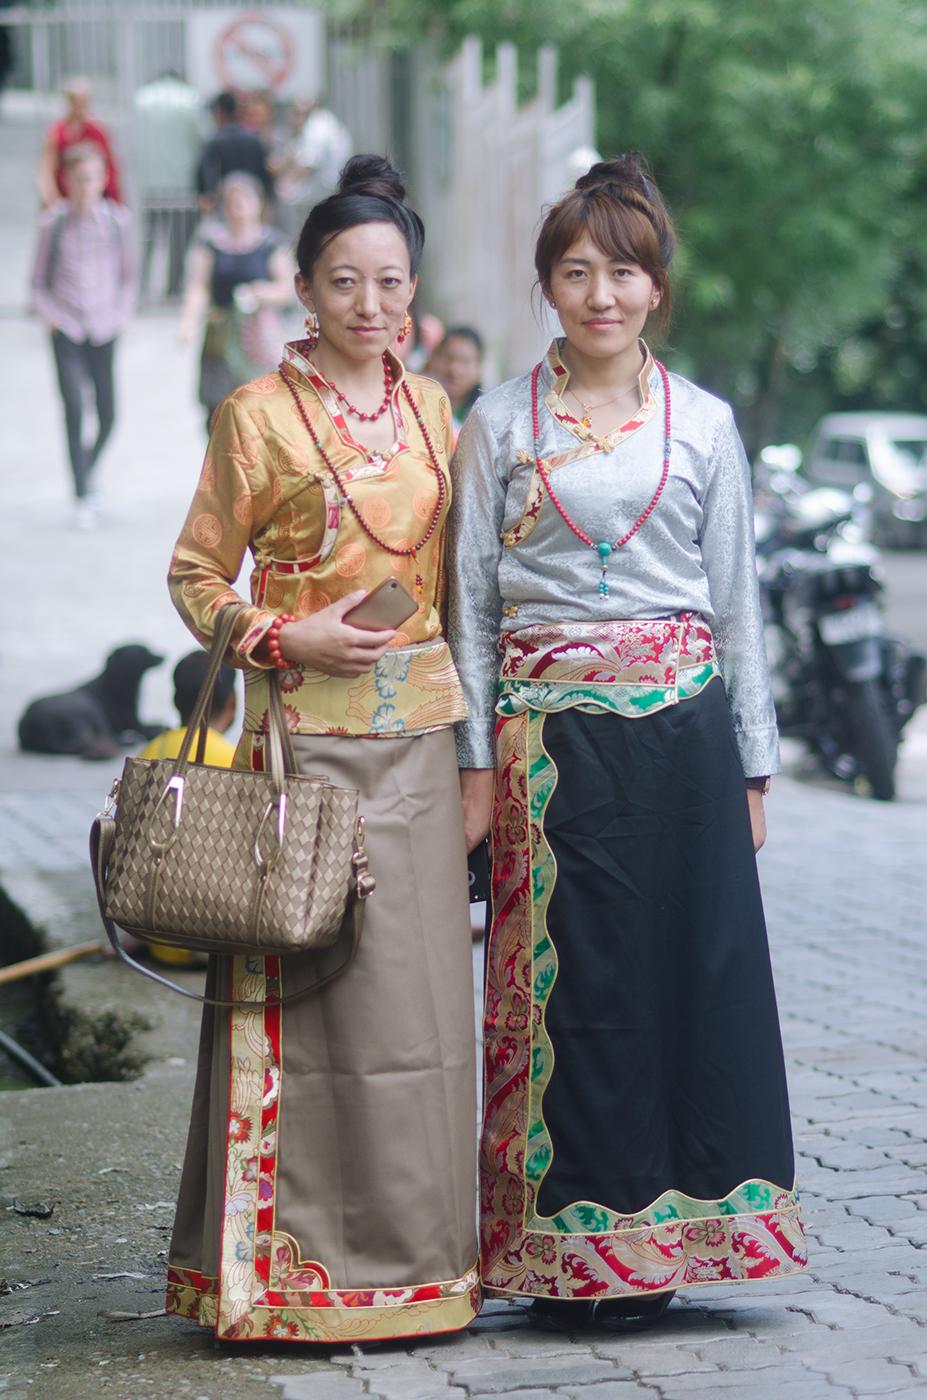 street style dharamsala india fashion wearabout blog